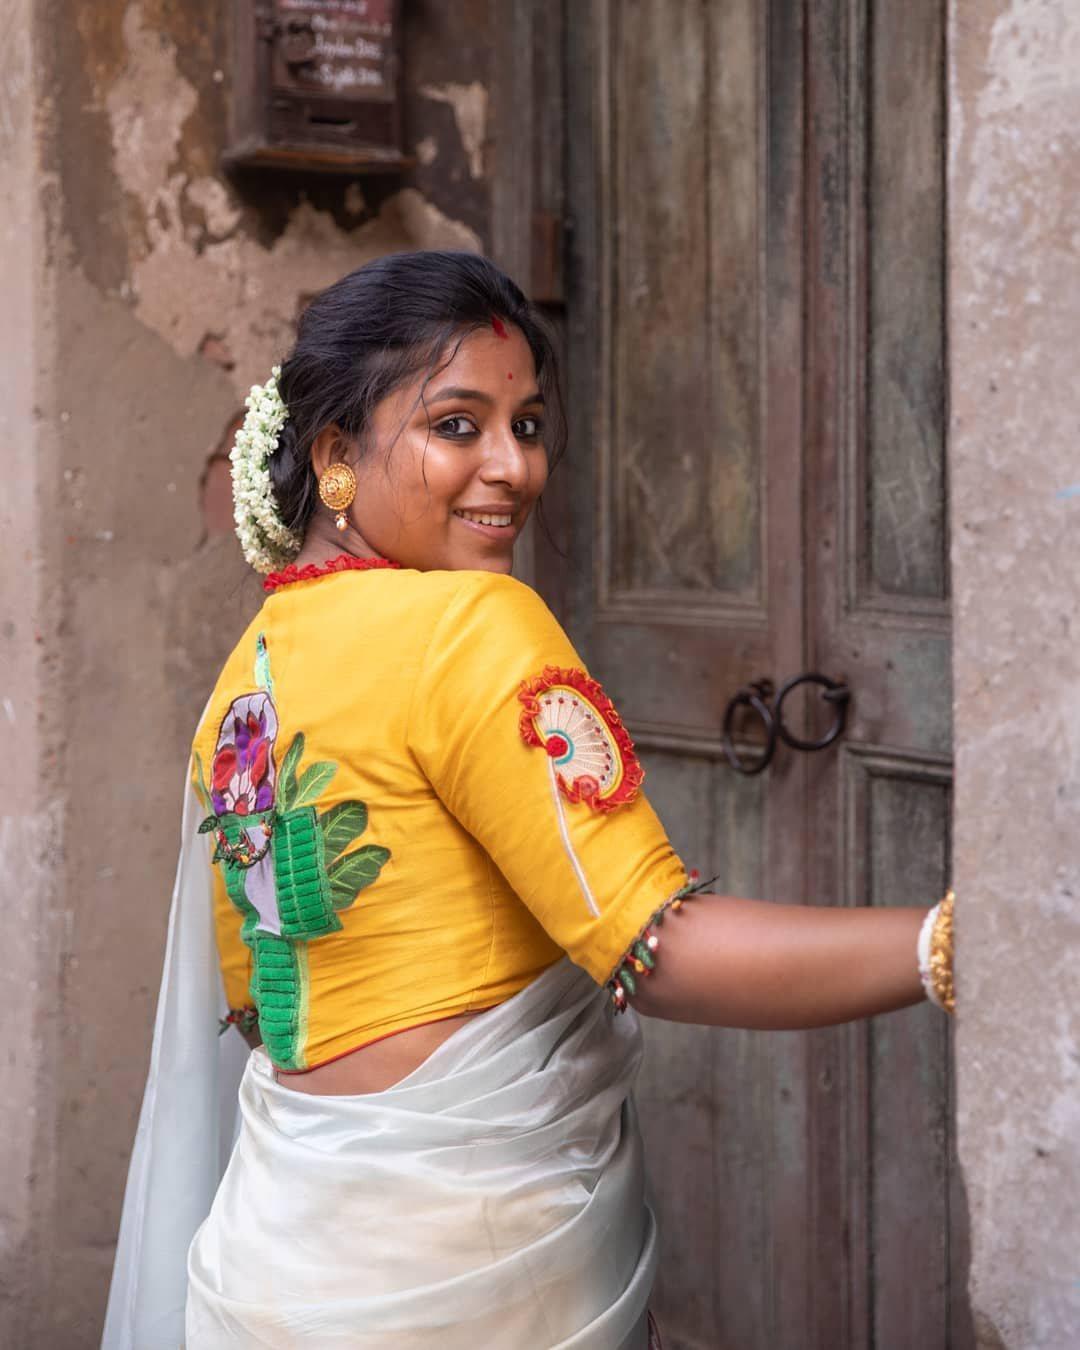 Handpainted calcutta theme blouse-Sayanti Ghosh-2